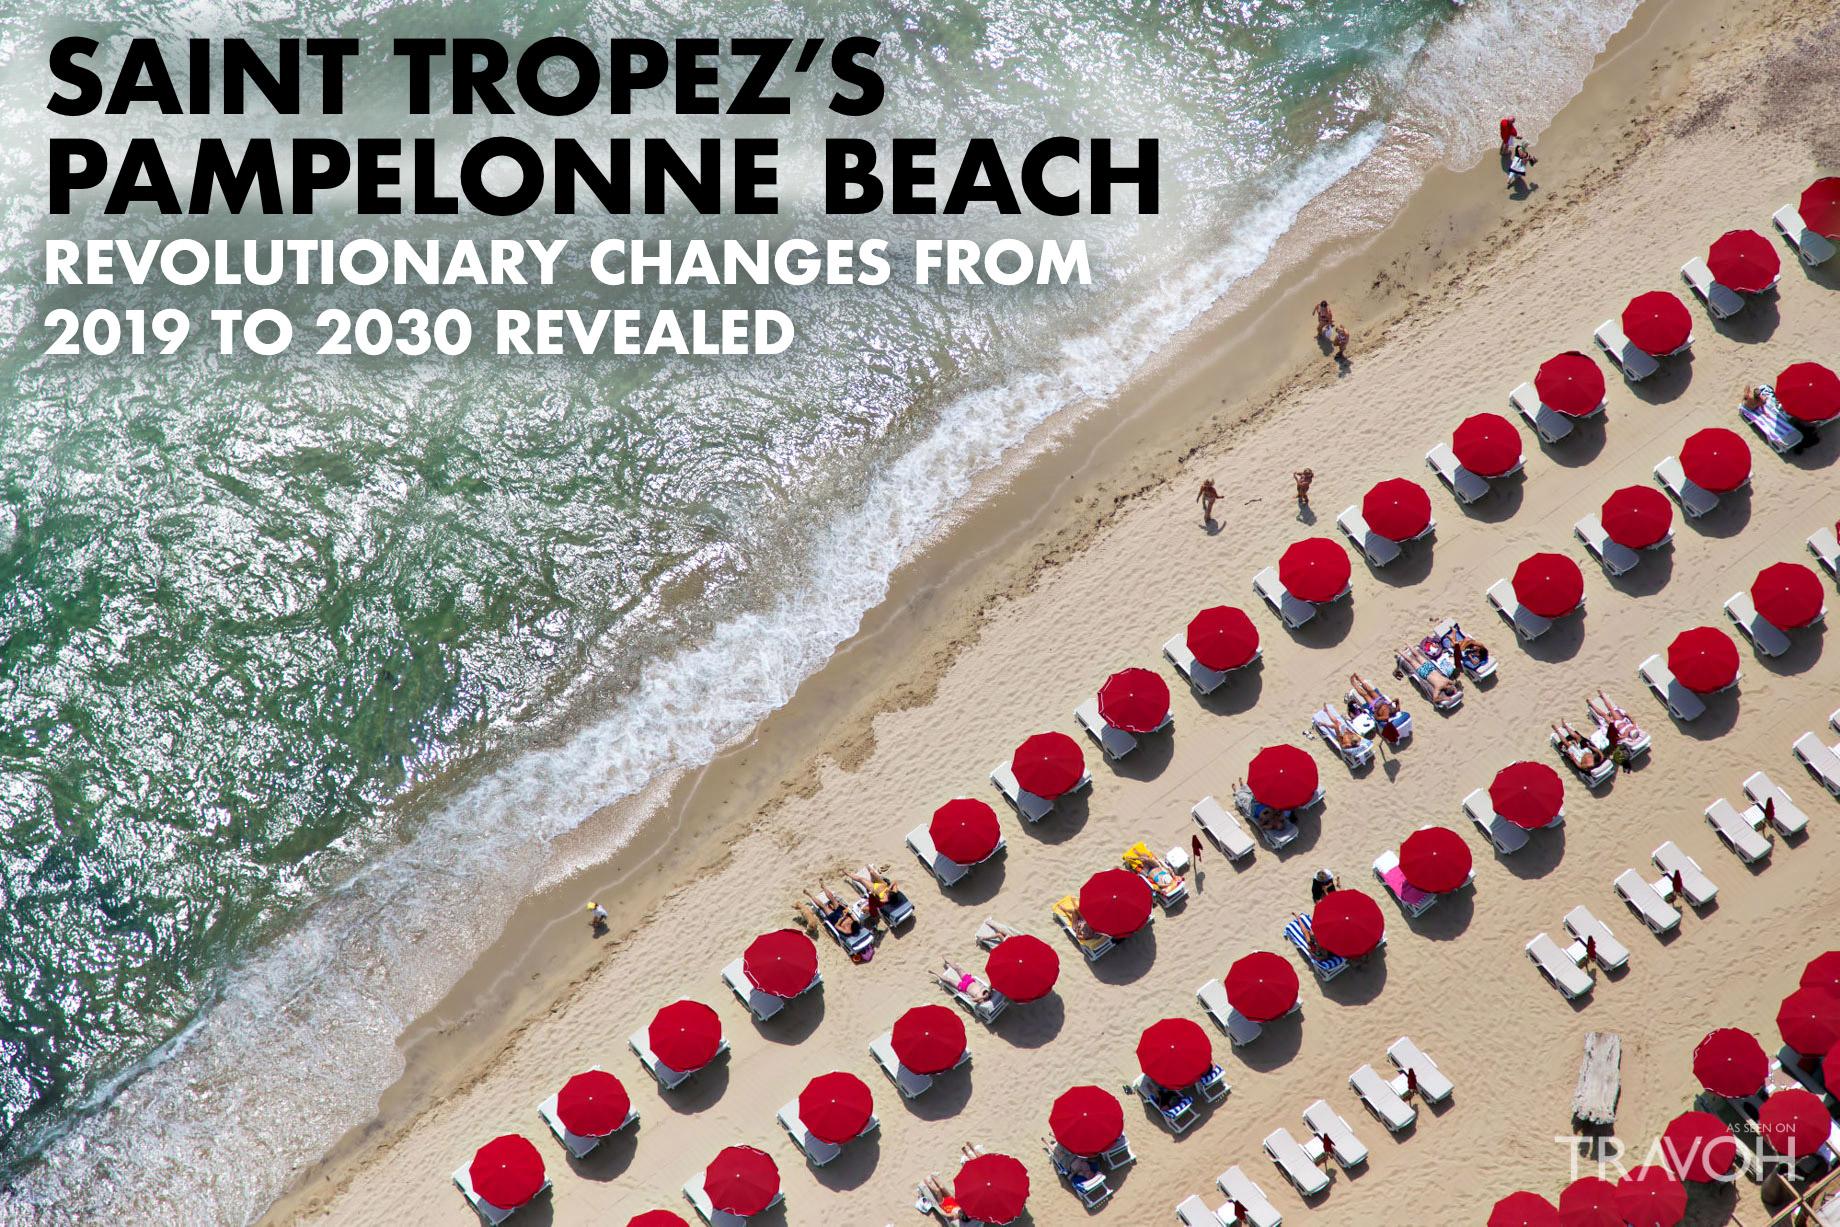 Saint-Tropez's Pampelonne Beach - Revolutionary Changes to 2030 Revealed